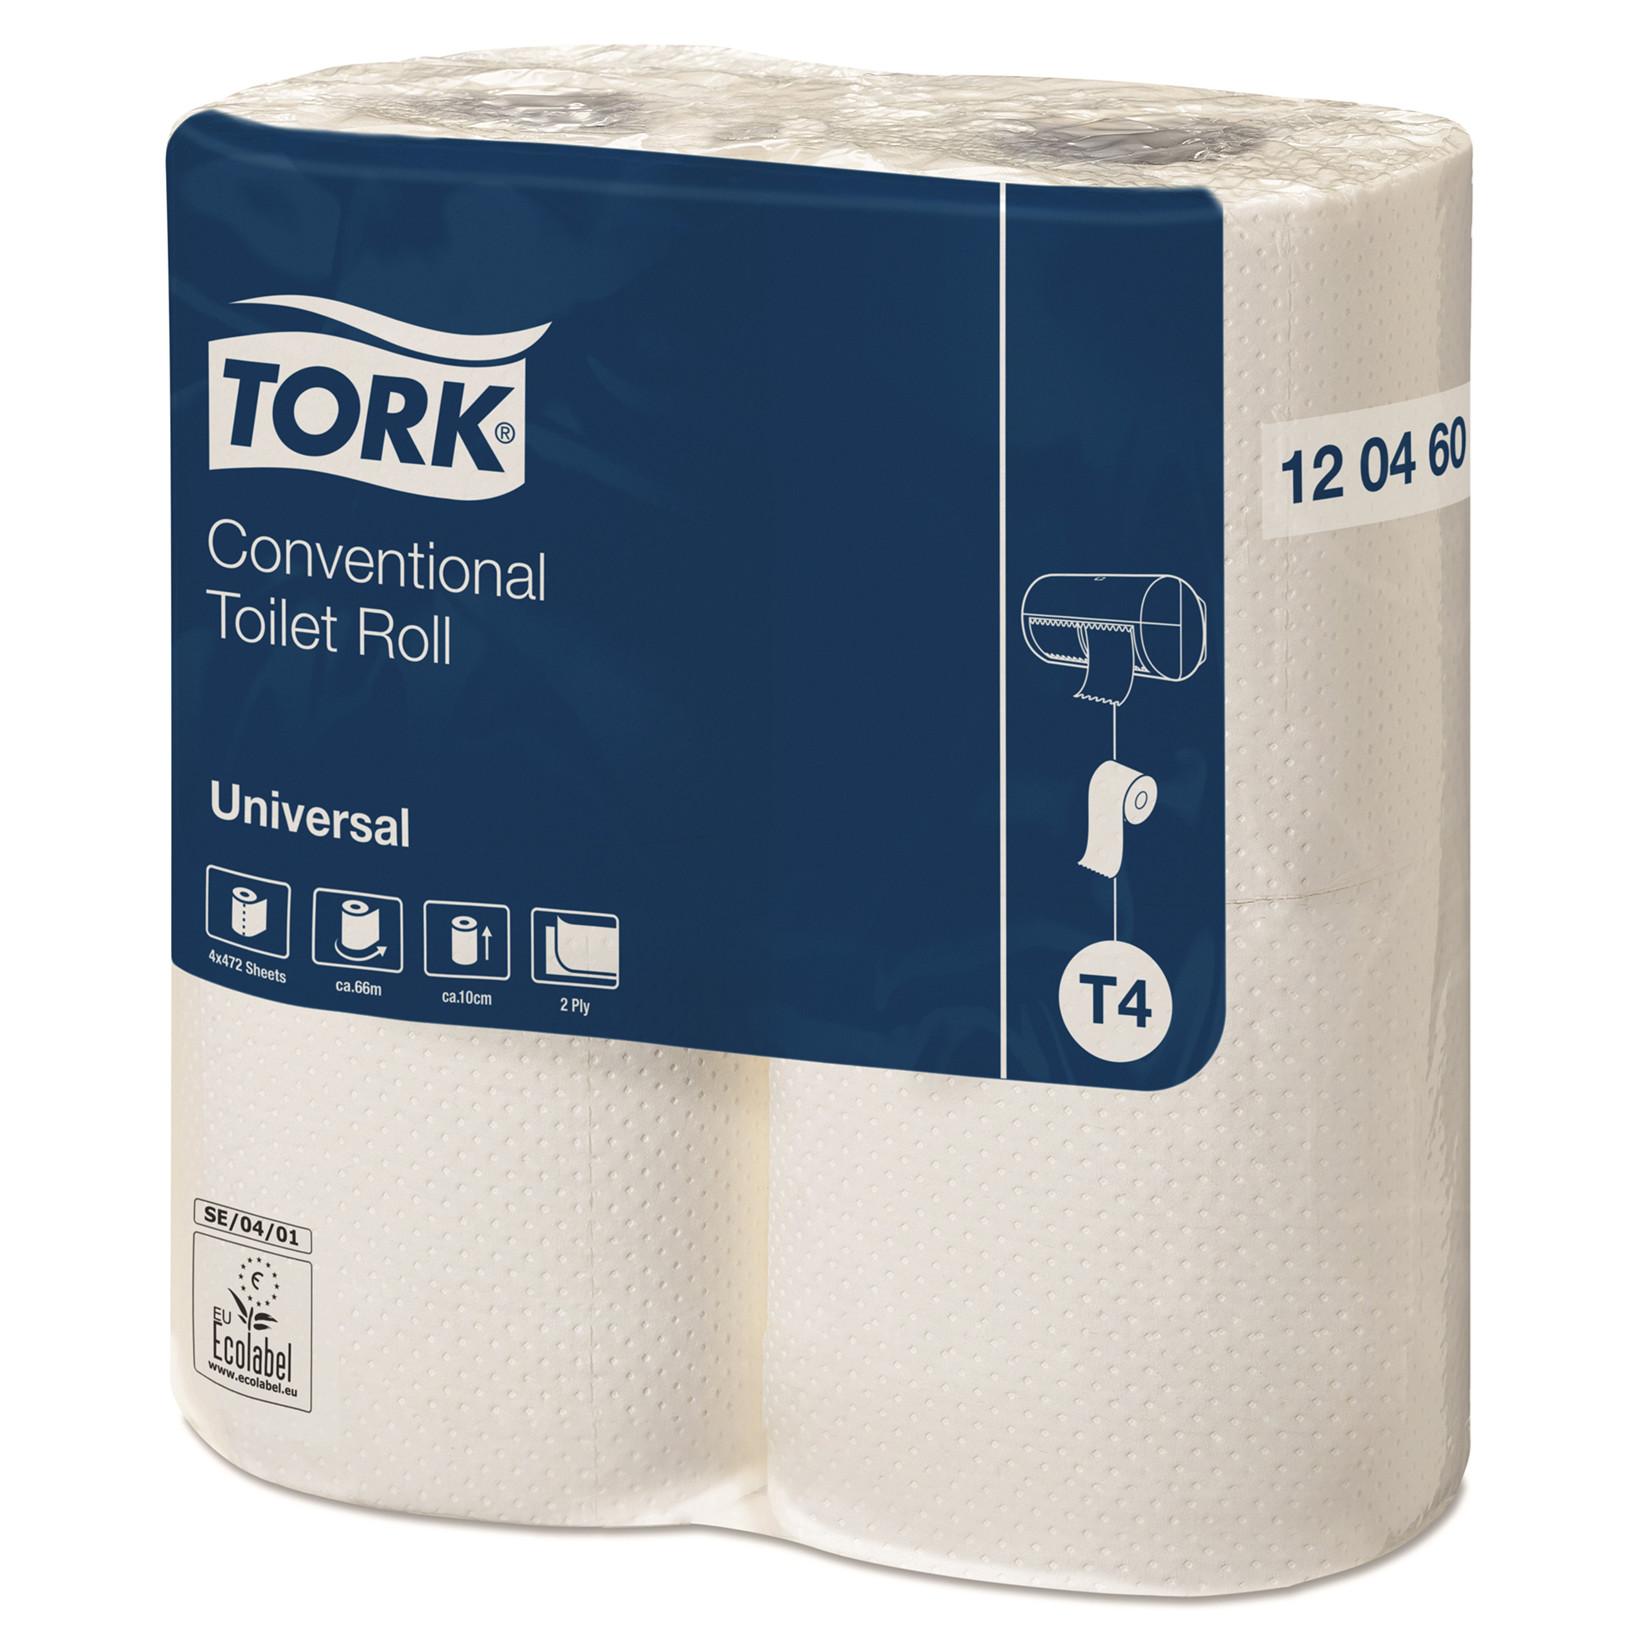 Tork 120460 Toiletpapir Universal 2 lag ekstra lang T4 - 24 ruller